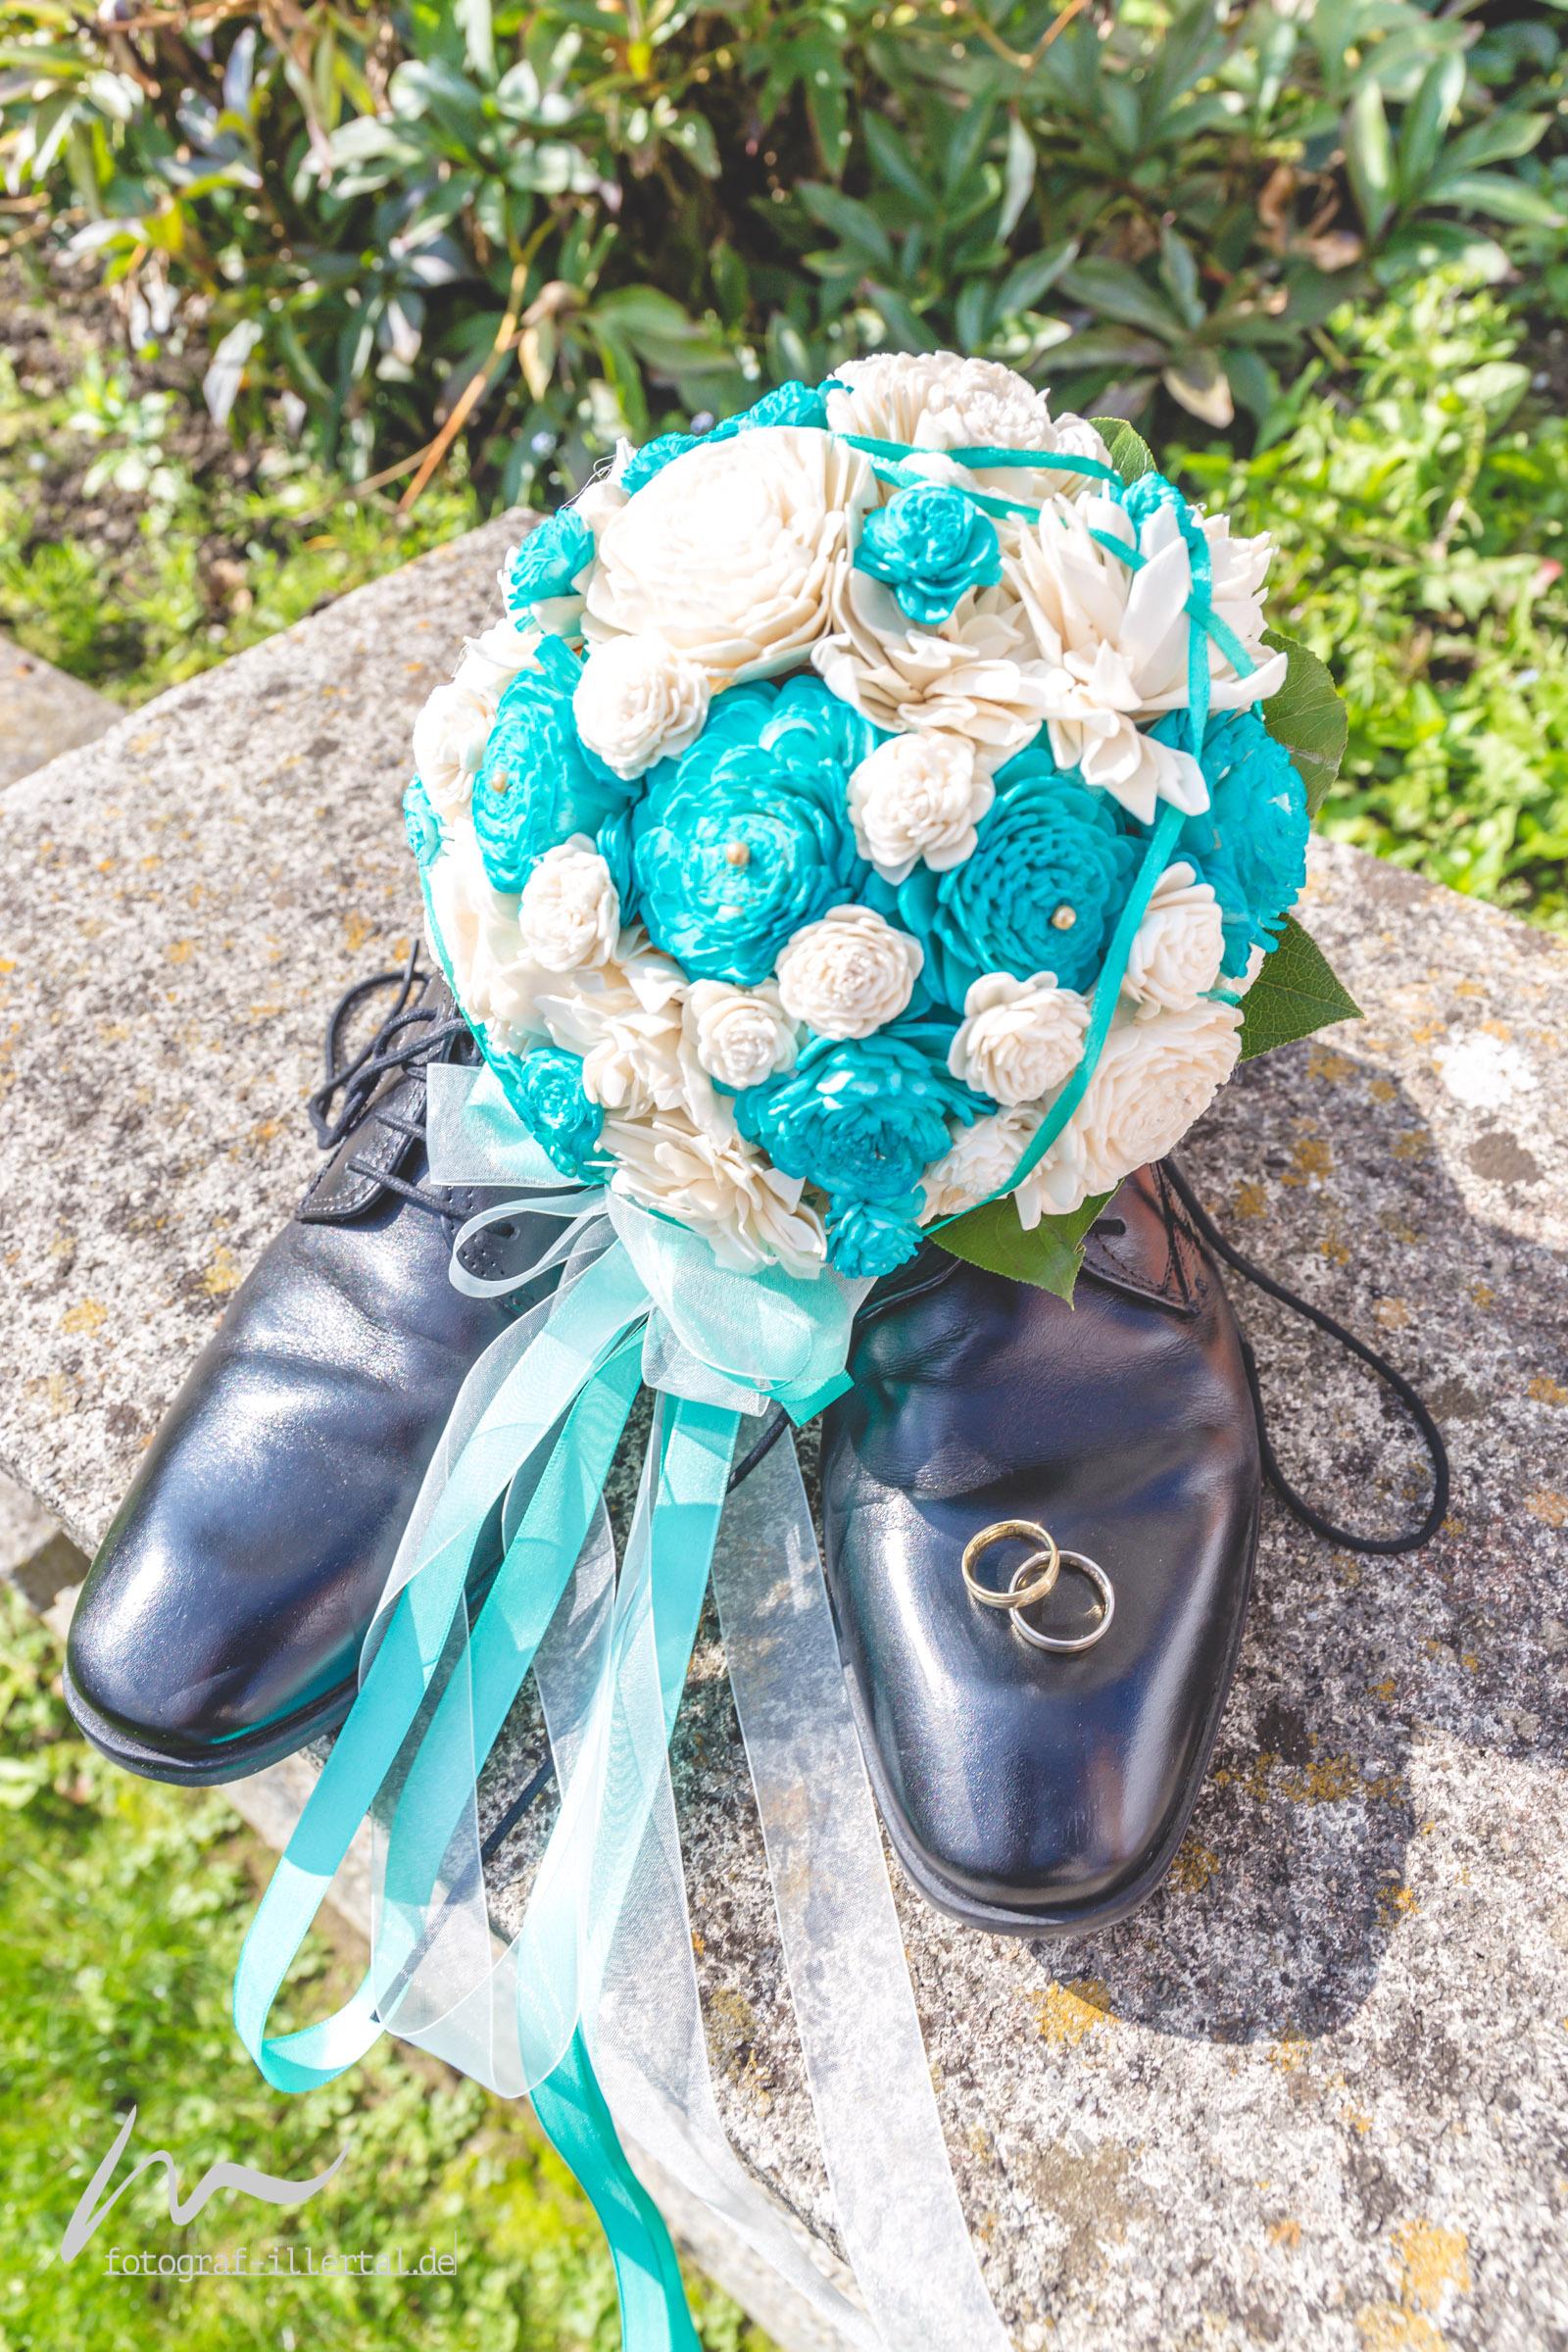 Fotograf Illertal-Christian Miller-Hochzeitsfotografie-_MG_8079